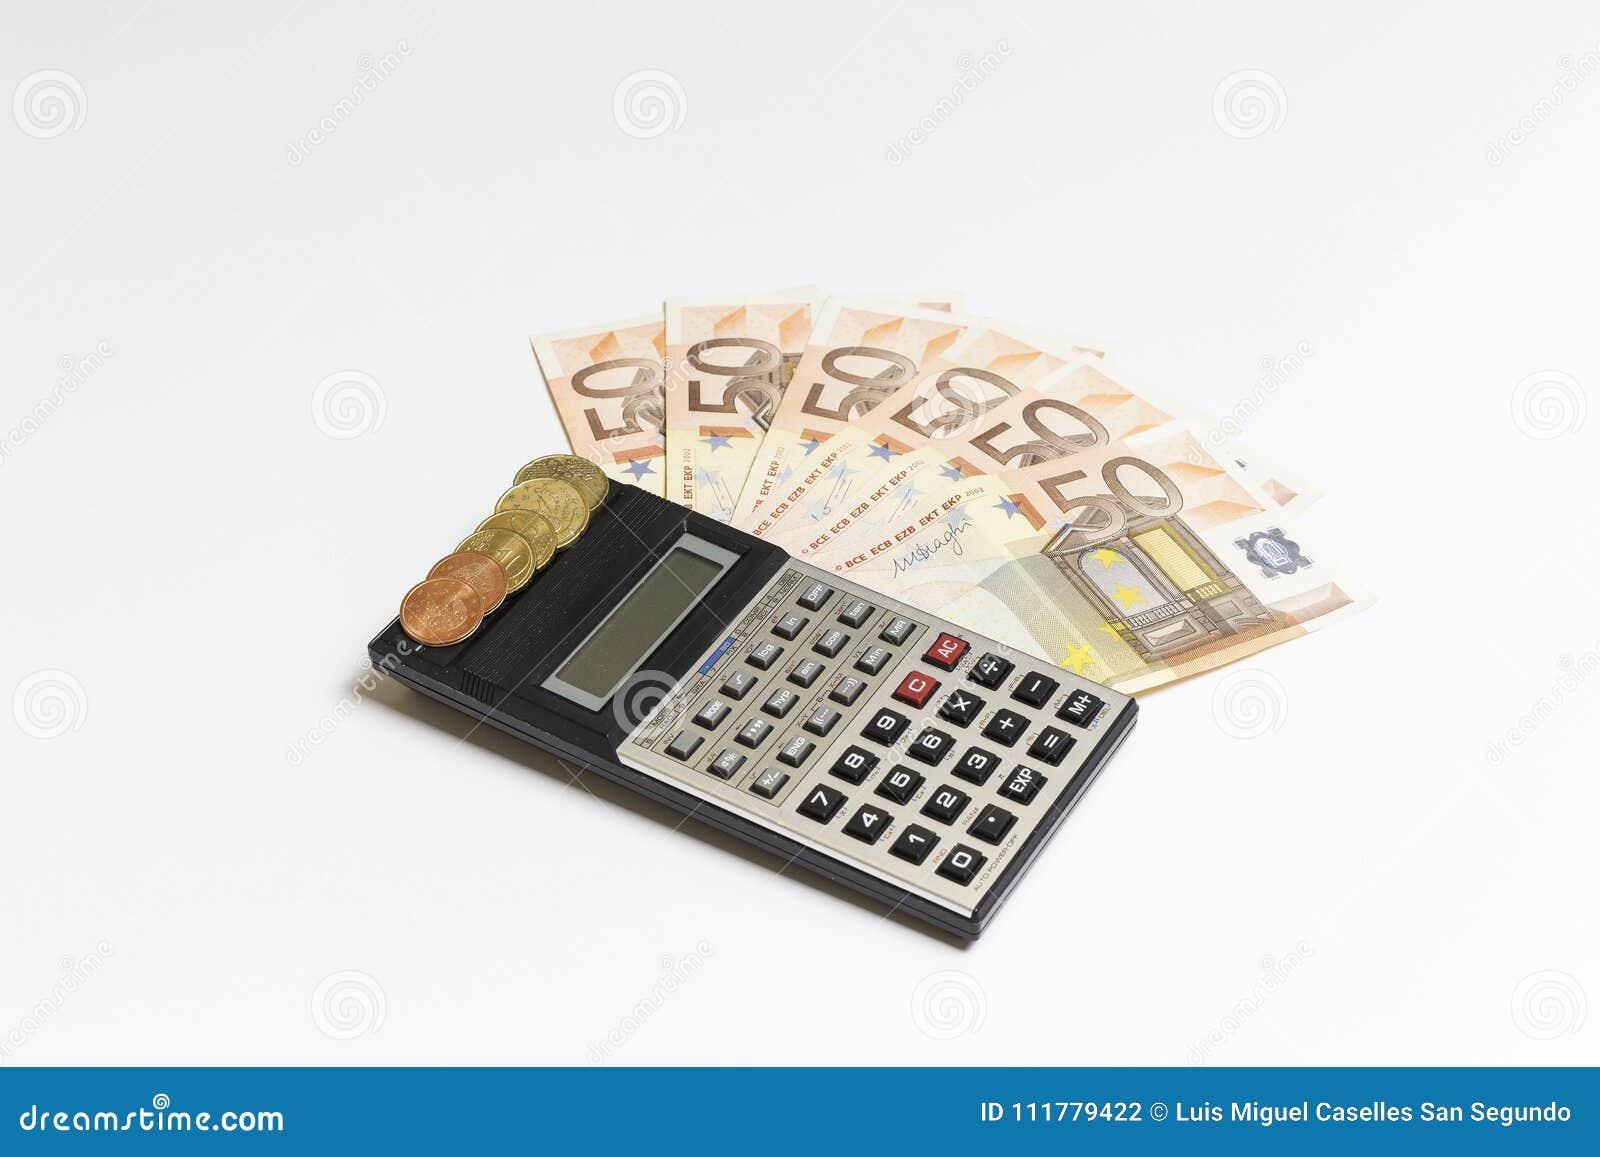 Banknotes, euro coins and a calculator